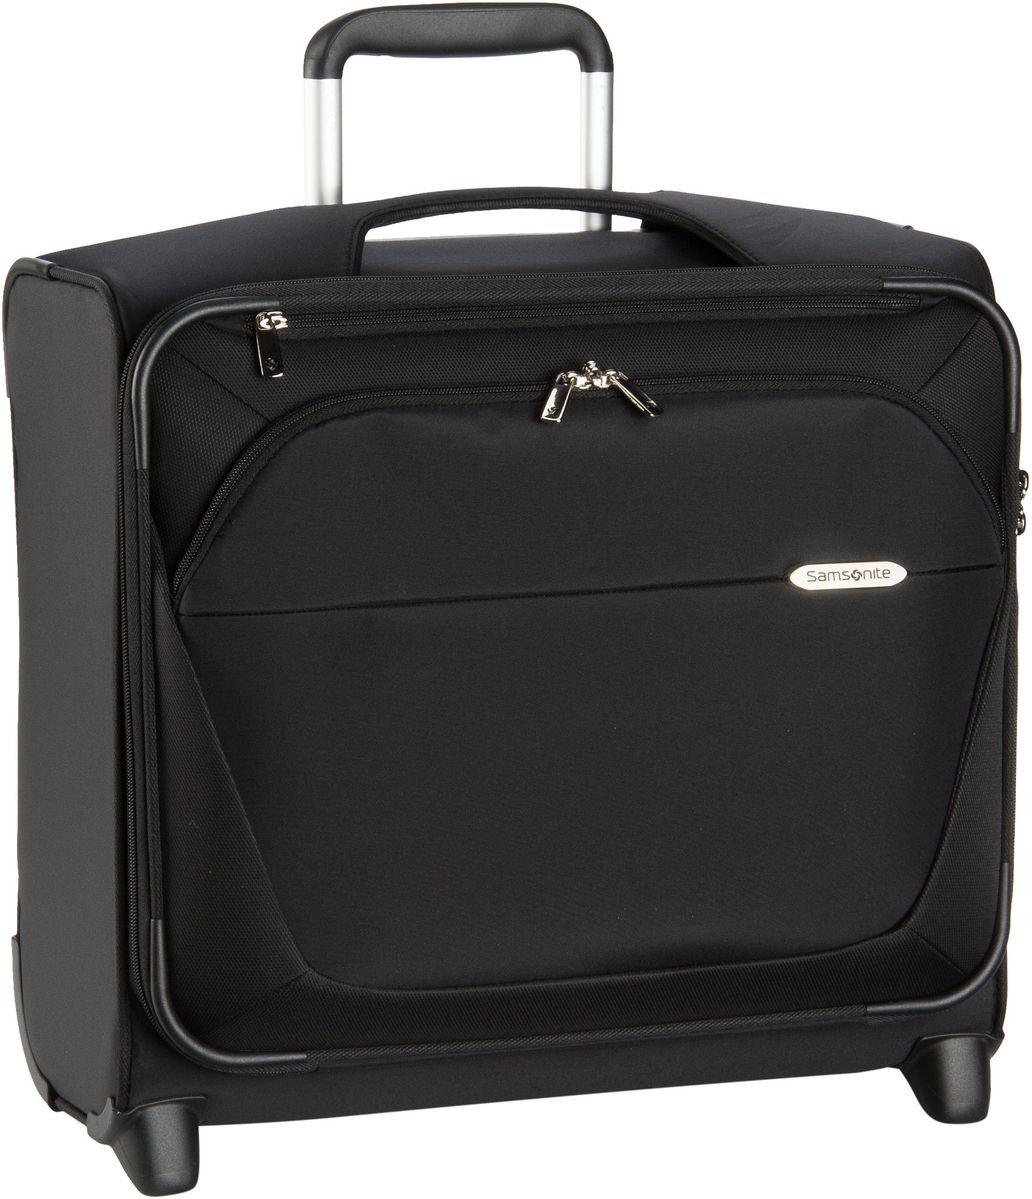 samsonite b lite 3 rolling tote preisvergleich koffer. Black Bedroom Furniture Sets. Home Design Ideas